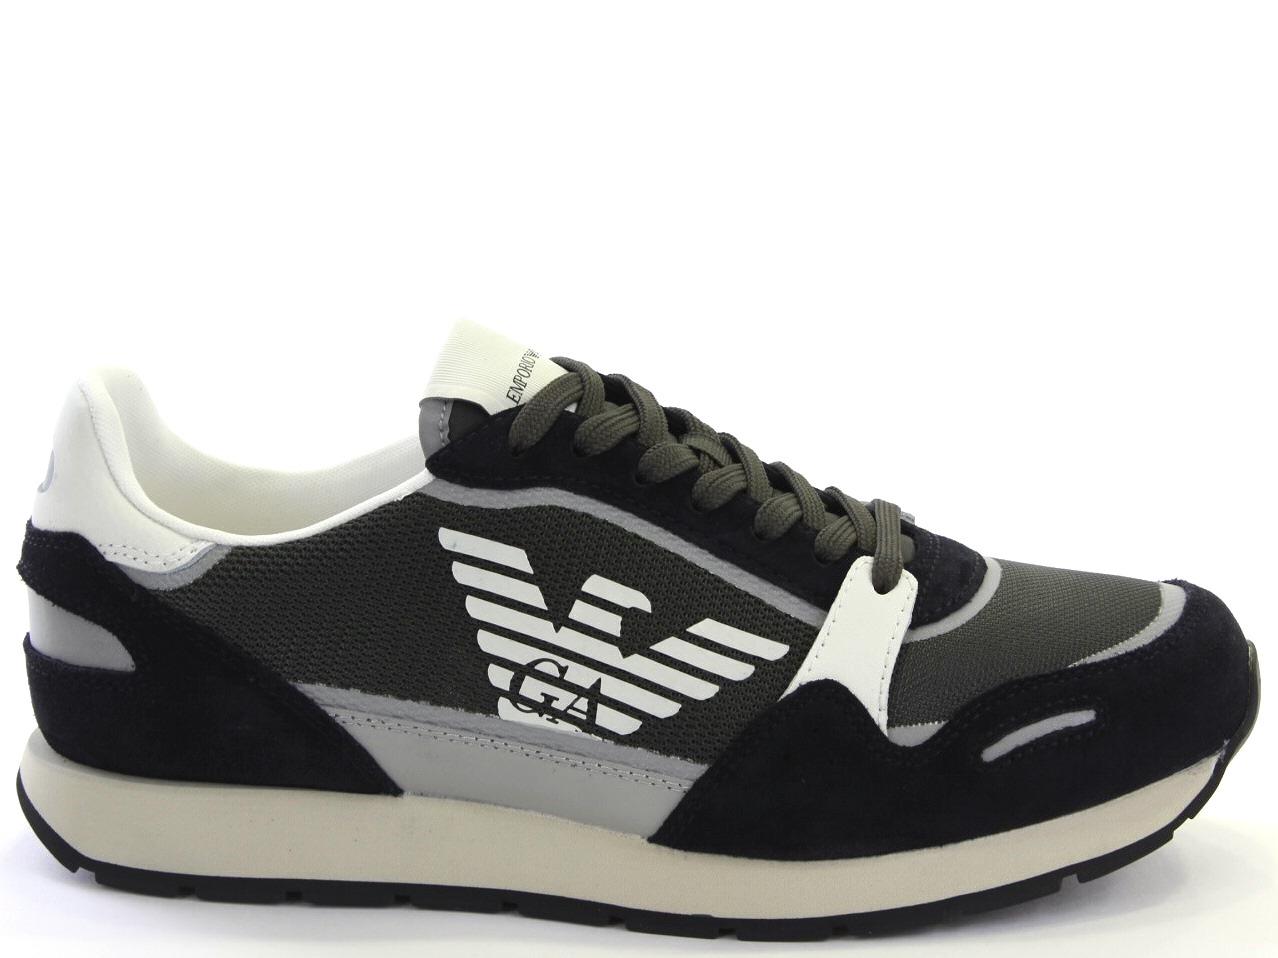 Sneakers, Espadrilles Armani, Emporio - 529 X4X537 XM678 Q446